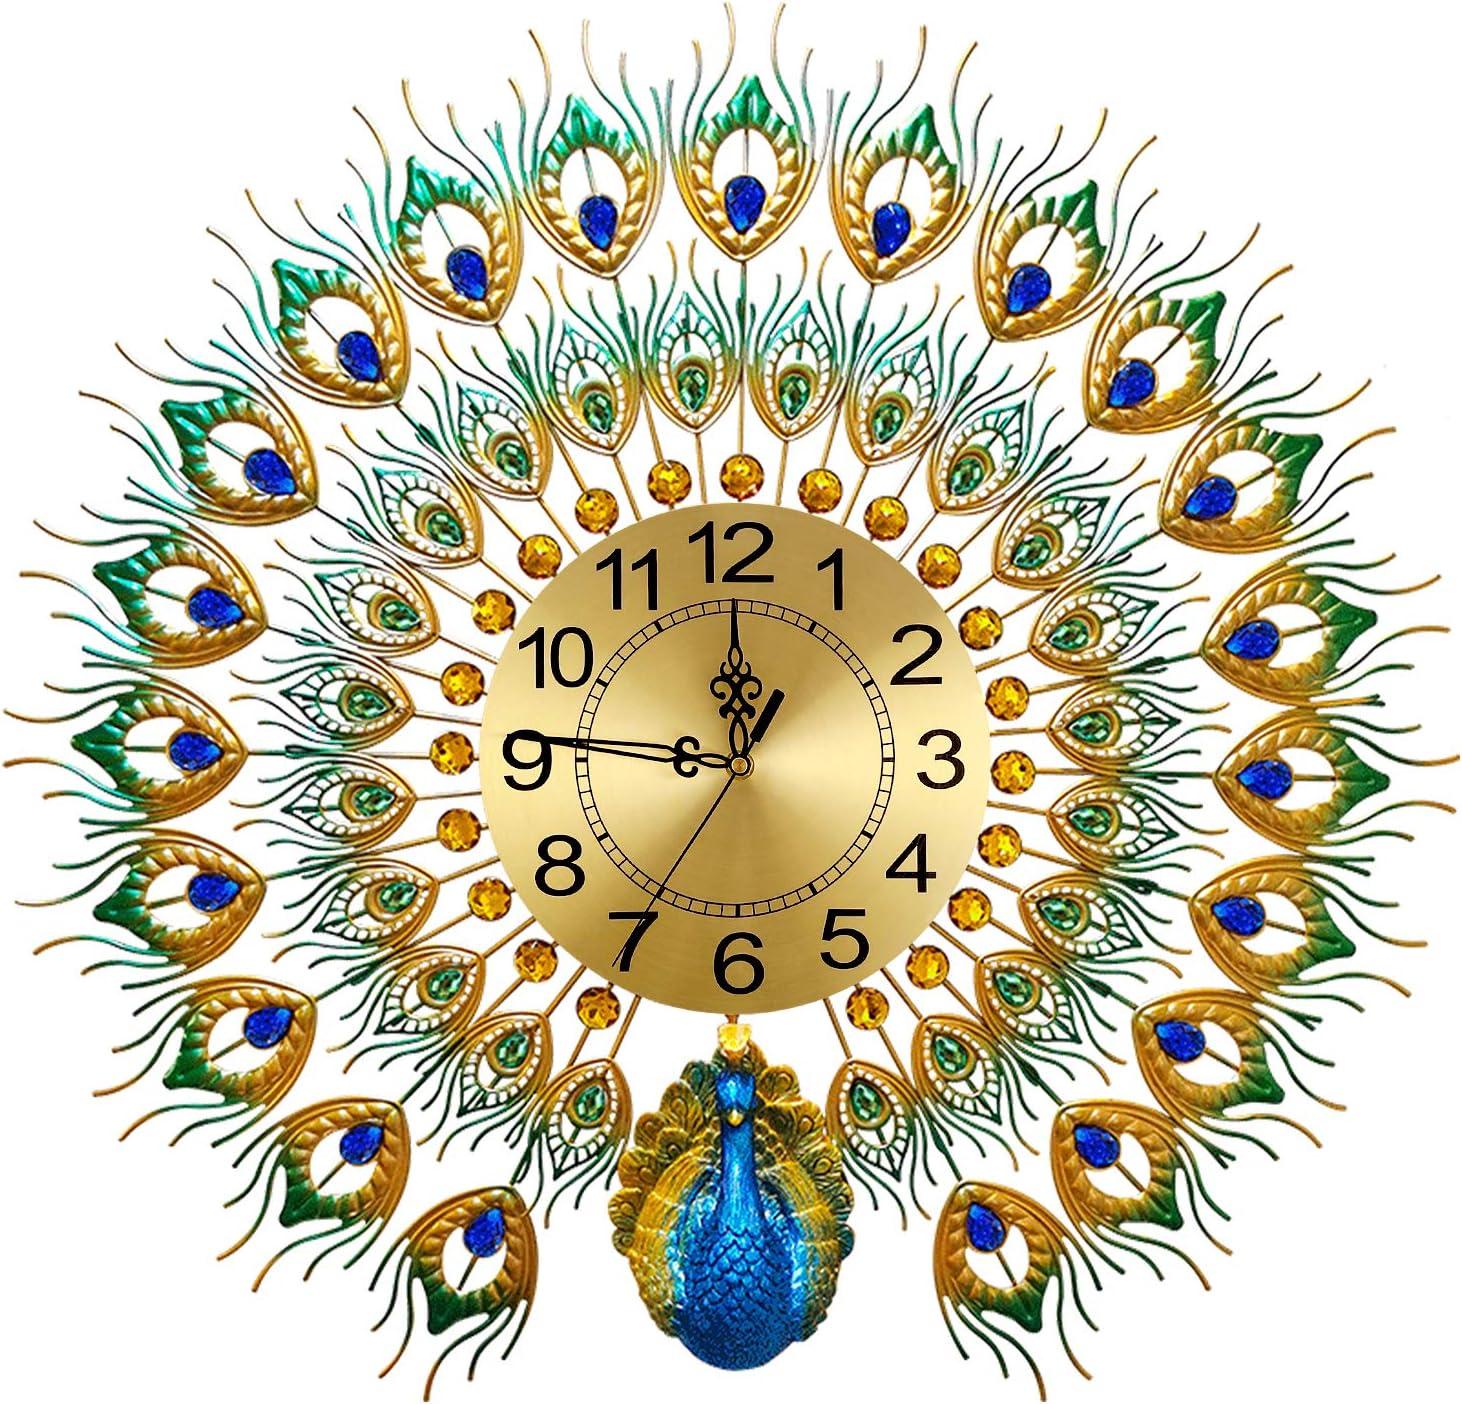 Large Peacock Wall Clock 27.6 inch Metal Design Non-Ticking Silent Art Digital Wall Clocks for Living Room Decor